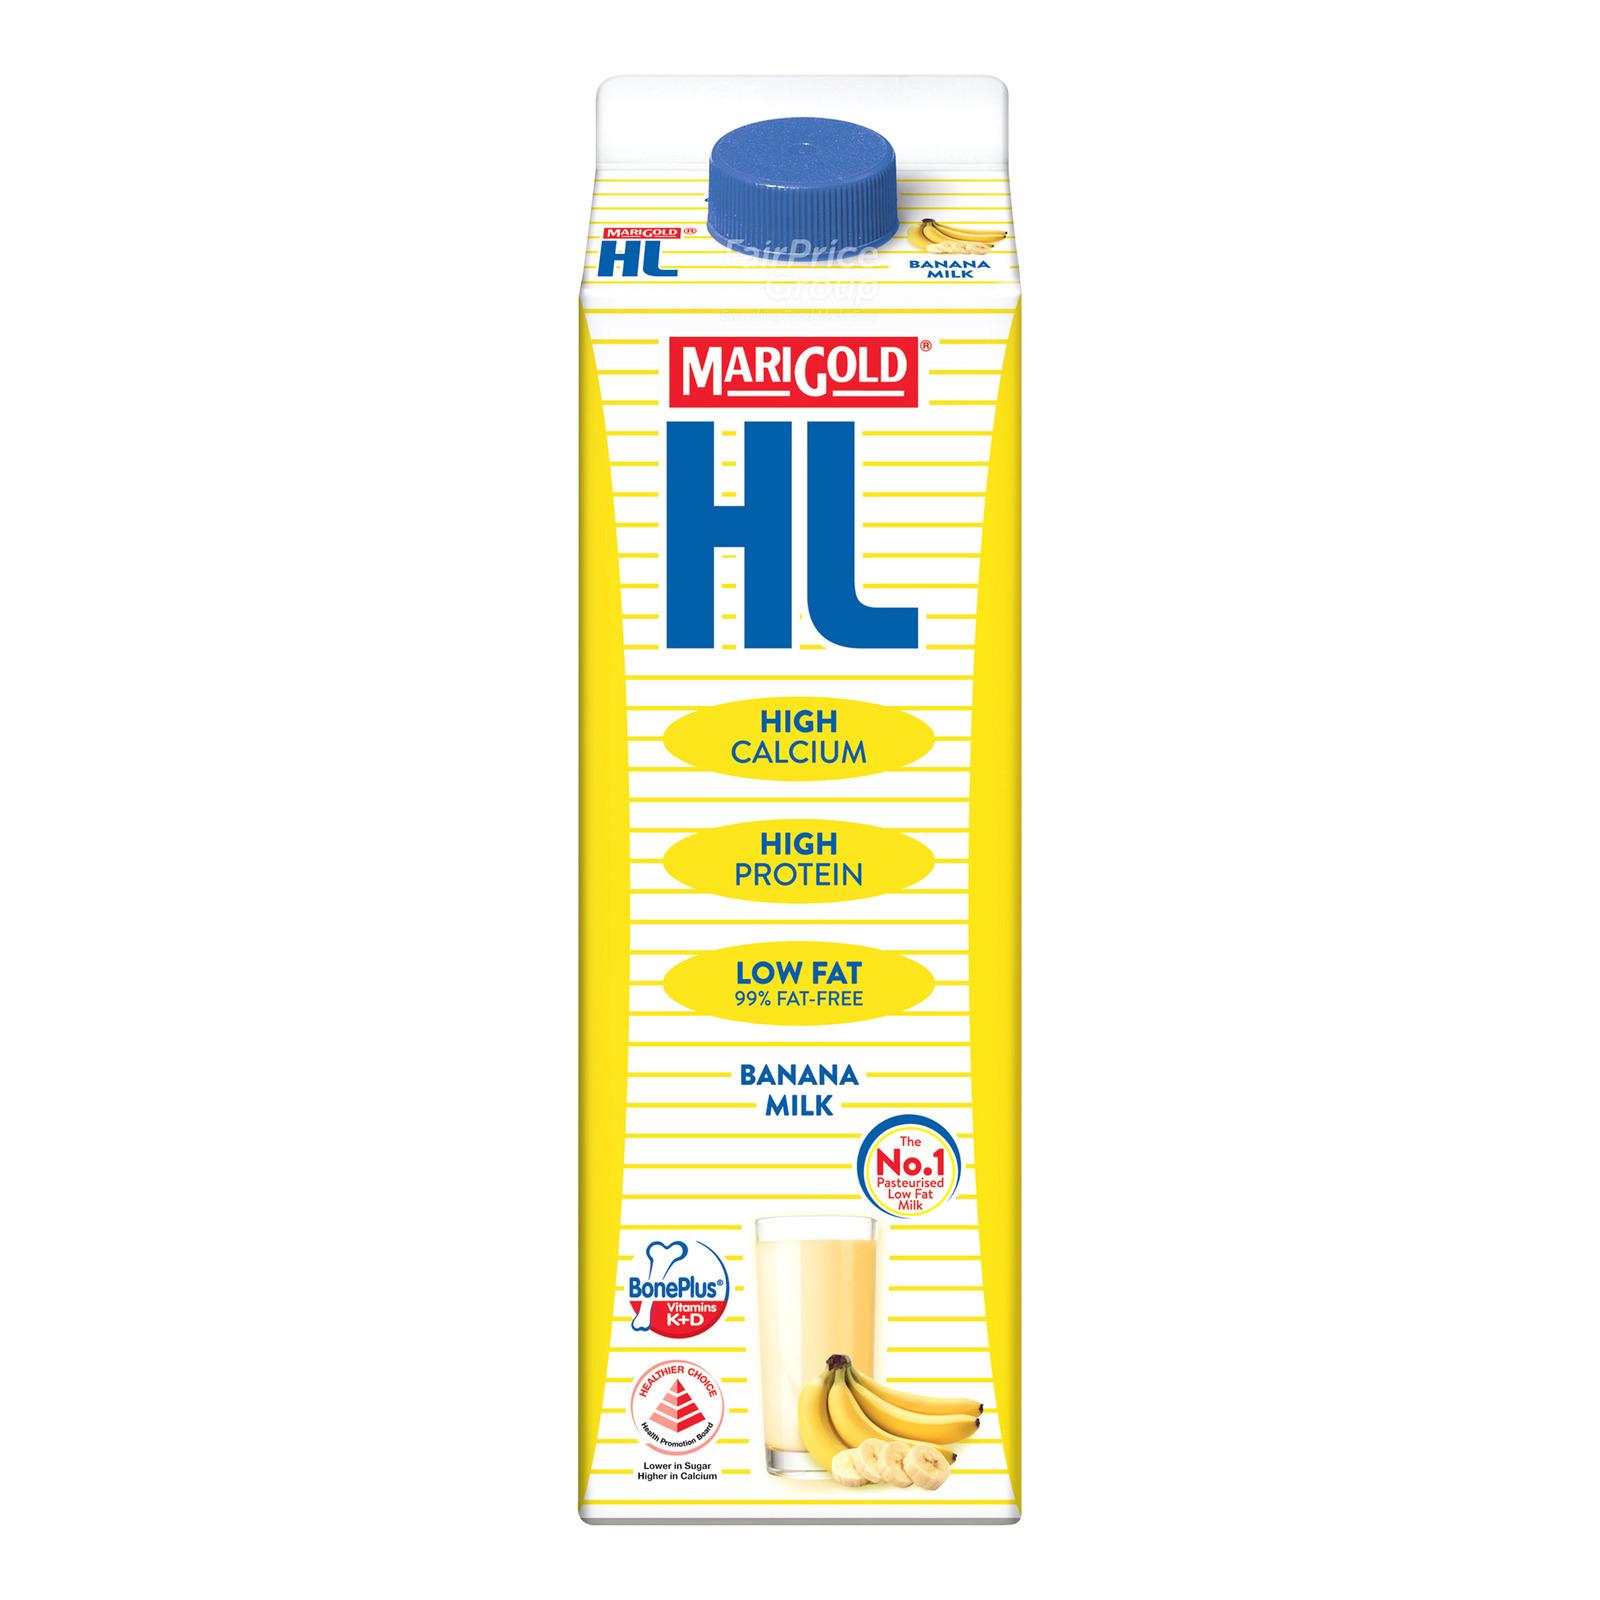 Marigold HL Milk - Banana